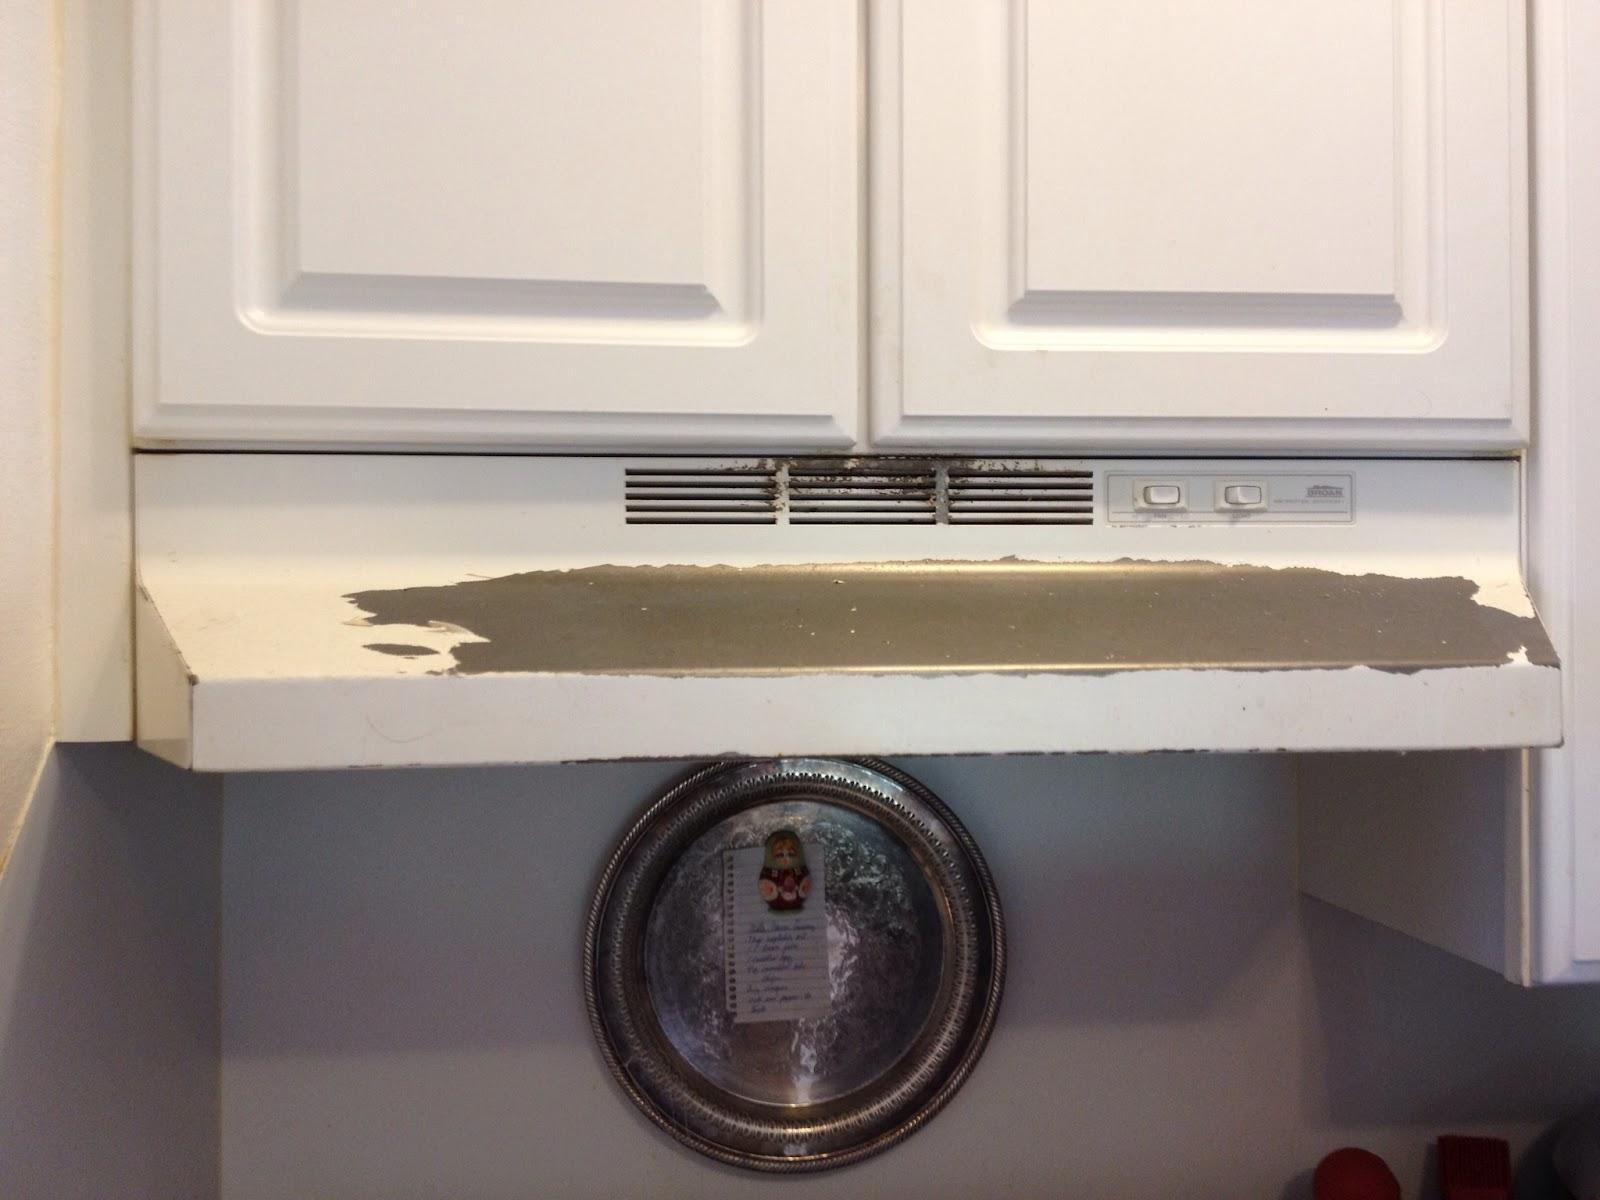 Kitchen Air Vent | The Creaking Floorboard Range Hood Re Do